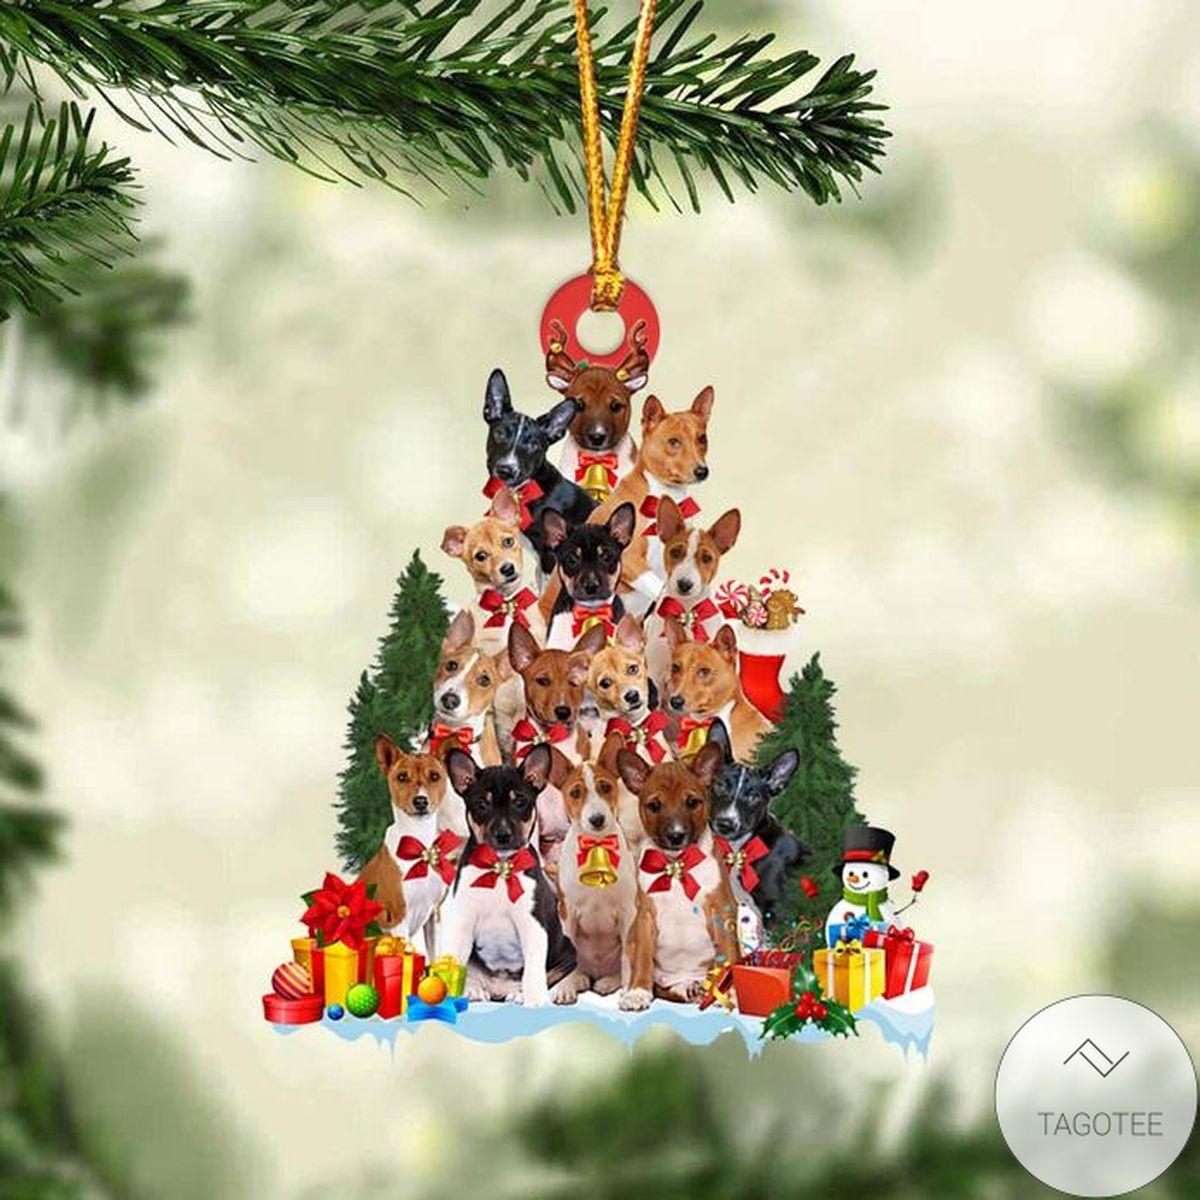 Basenji Dog Christmas Tree Ornament